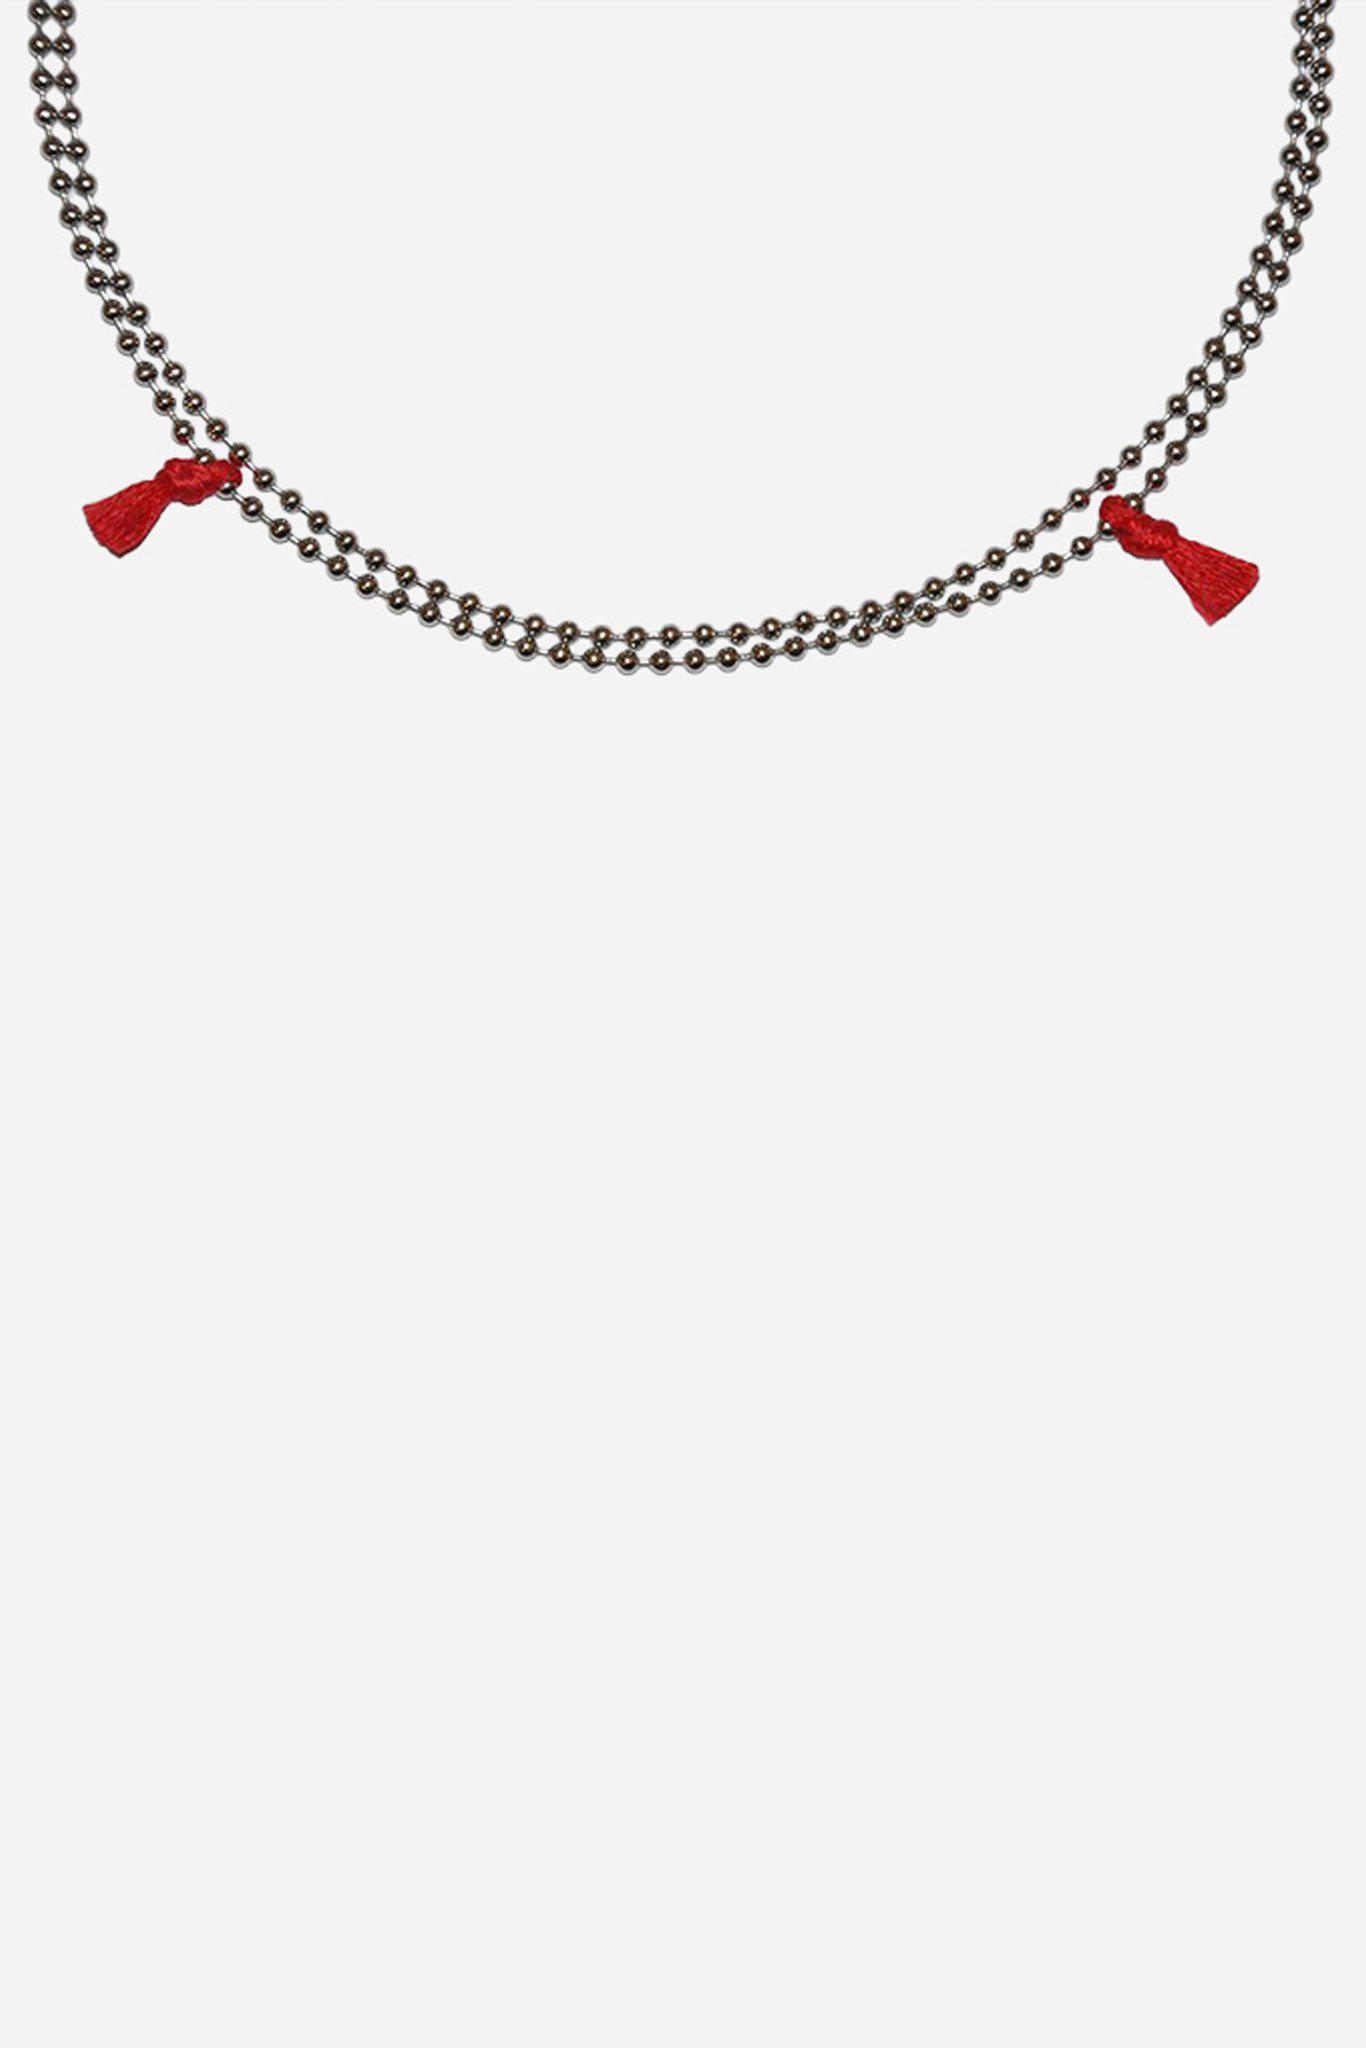 Nikolai Rose Silk Stainless Steel Mantra Iv Necklace